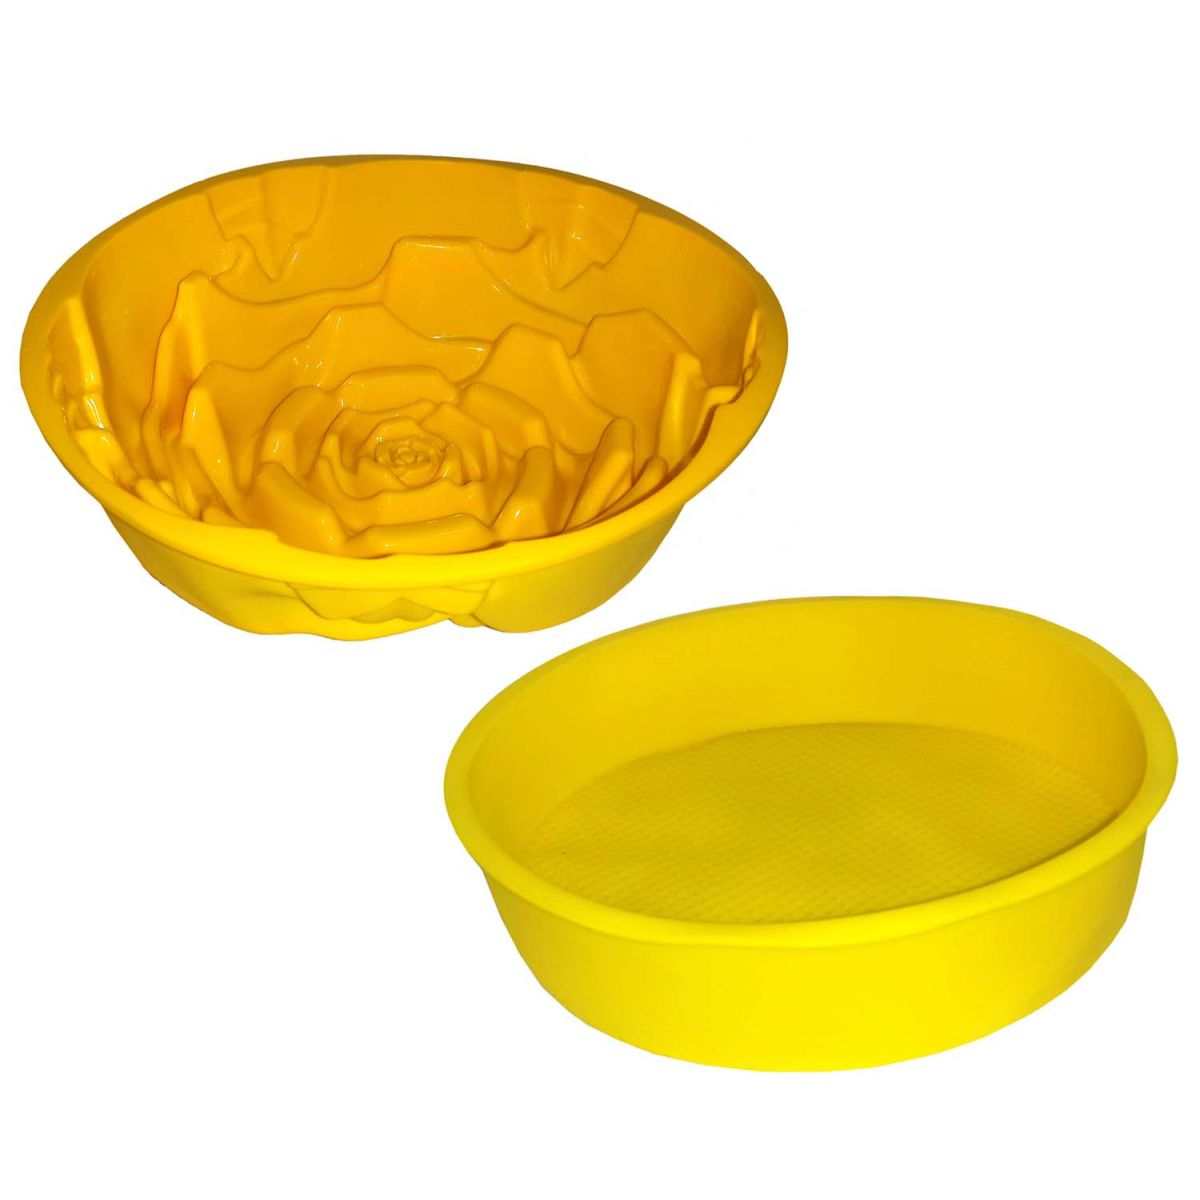 Conjunto Silicone Cozinha 2 Forma Doce Torta Flor Redonda Amarela (kit2-sili-6-11)